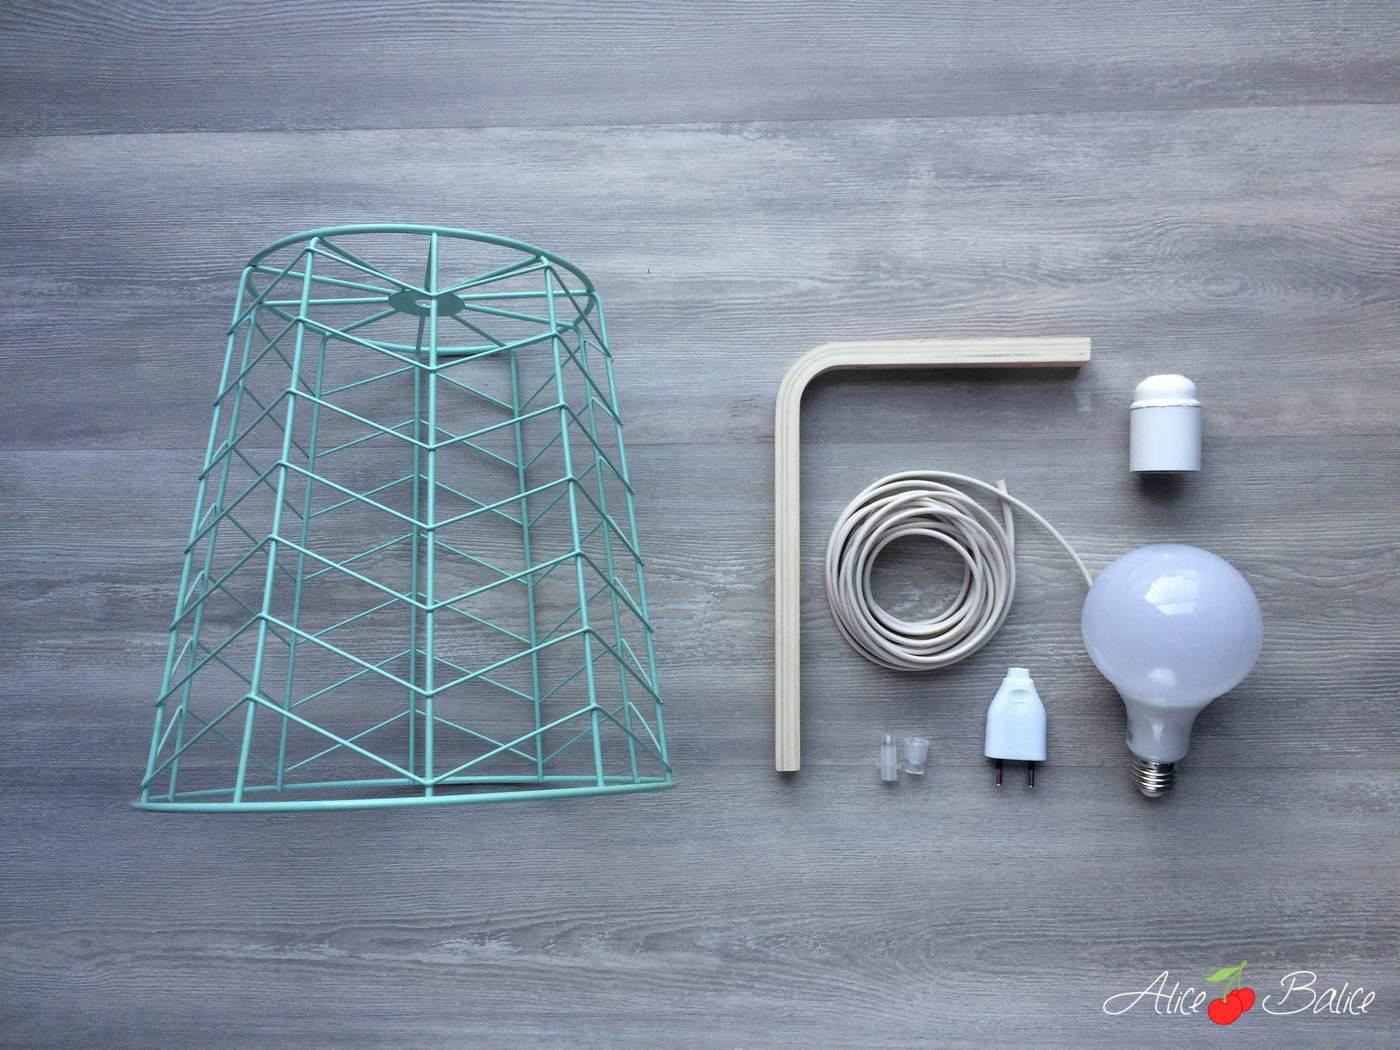 affordable lampe baladeuse design tuto diy gratuit corbeille papier mint cuivre with lampe. Black Bedroom Furniture Sets. Home Design Ideas